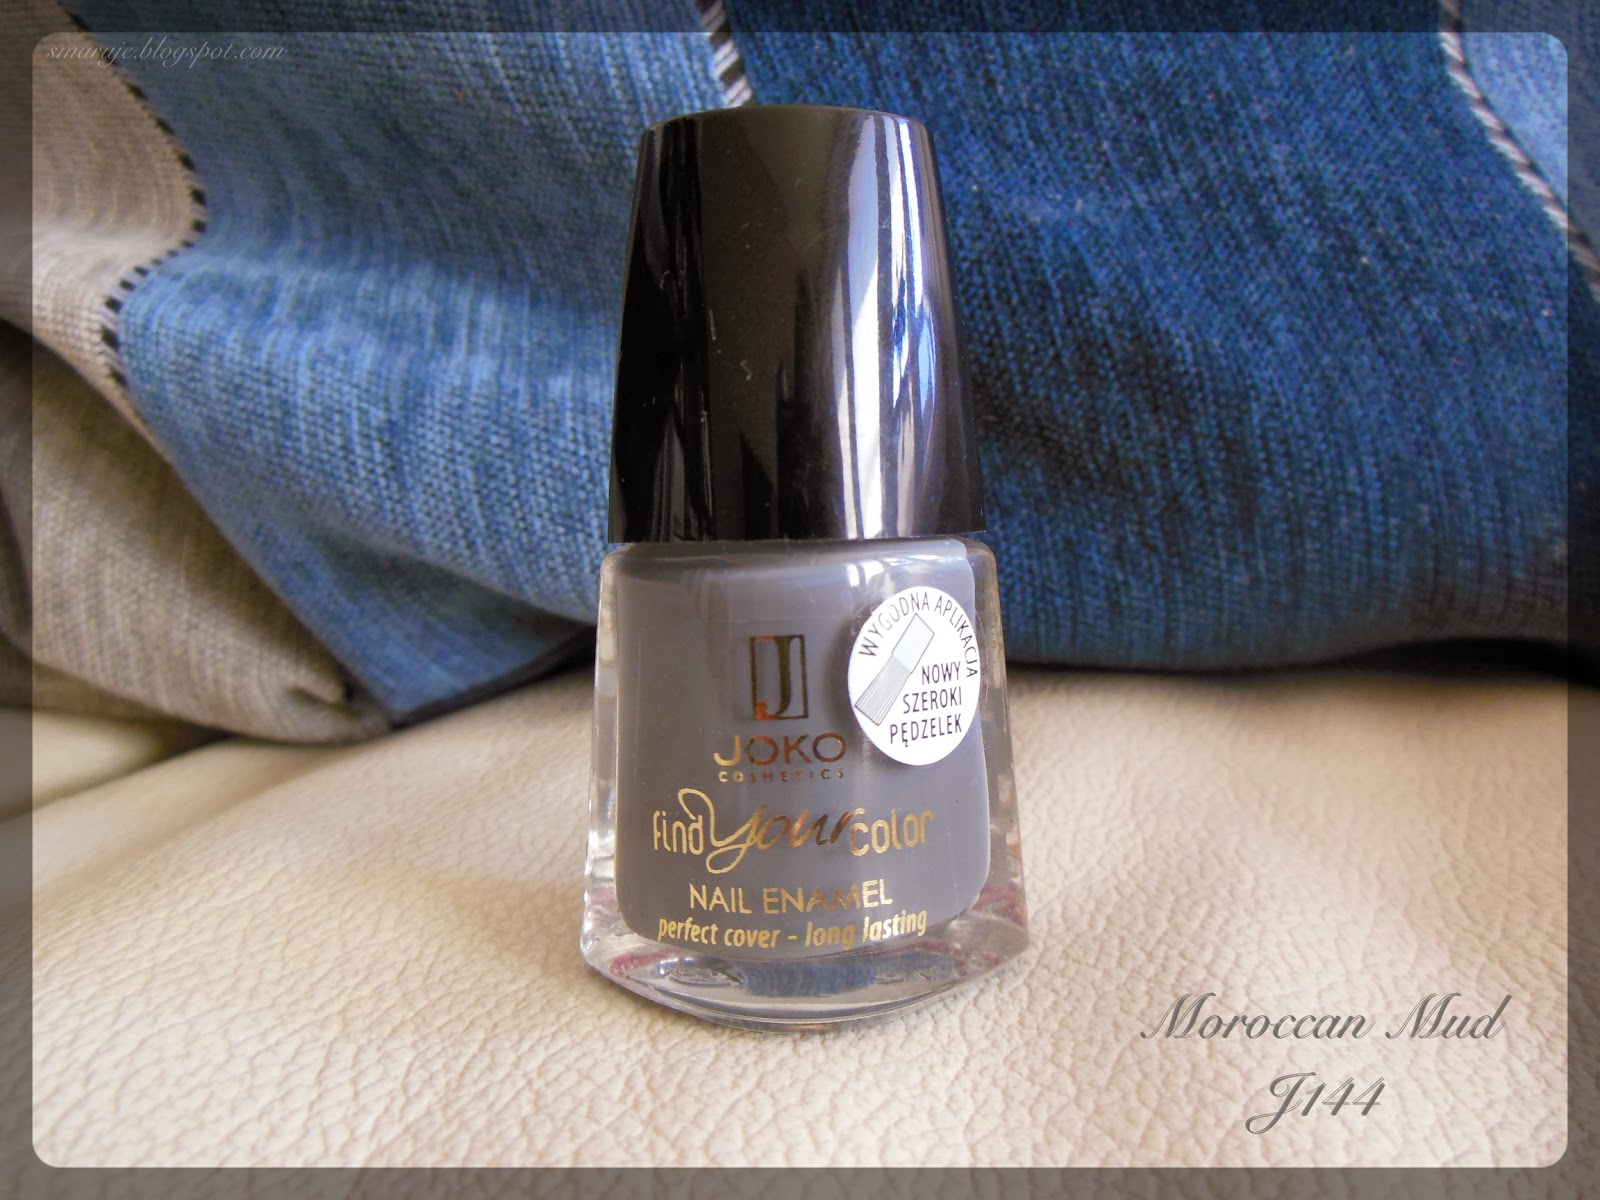 Moja idealna zimowa szarość: Joko –Find Your Color – J144 Moroccan Mud